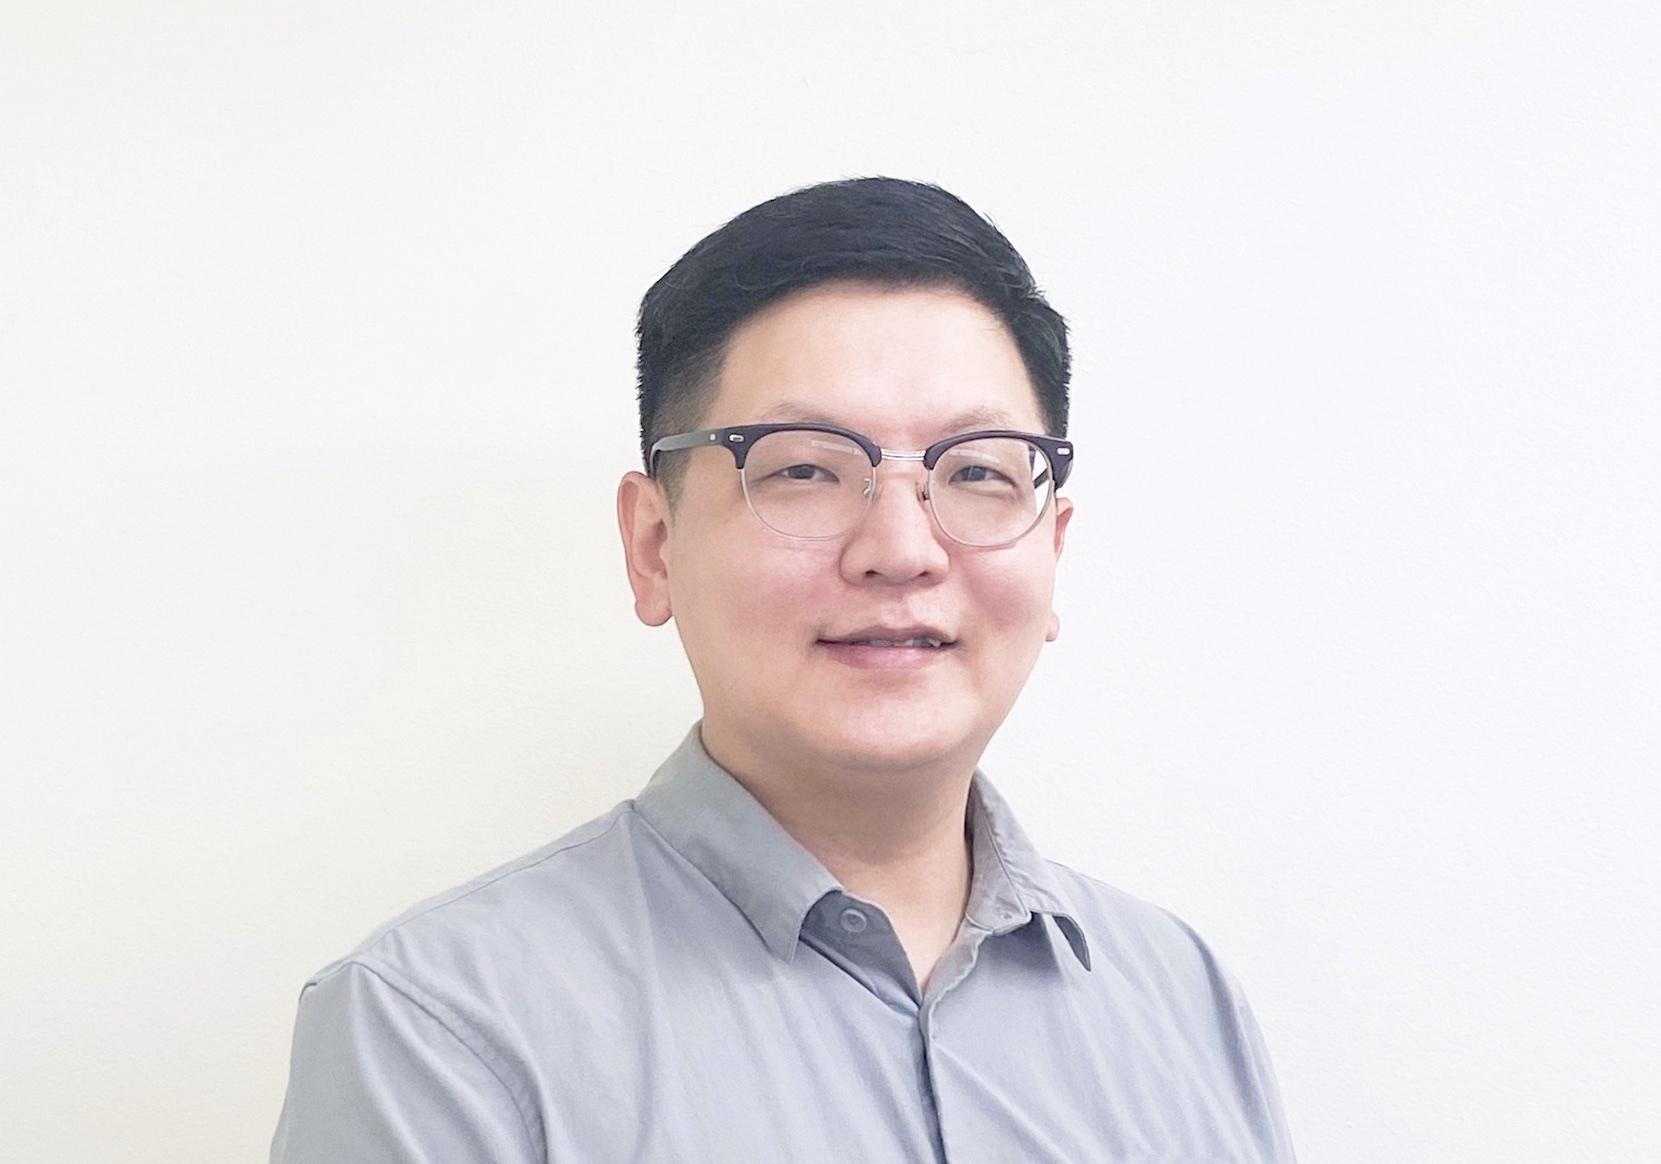 YONGSUK KIM Financial Professional & Insurance Agent